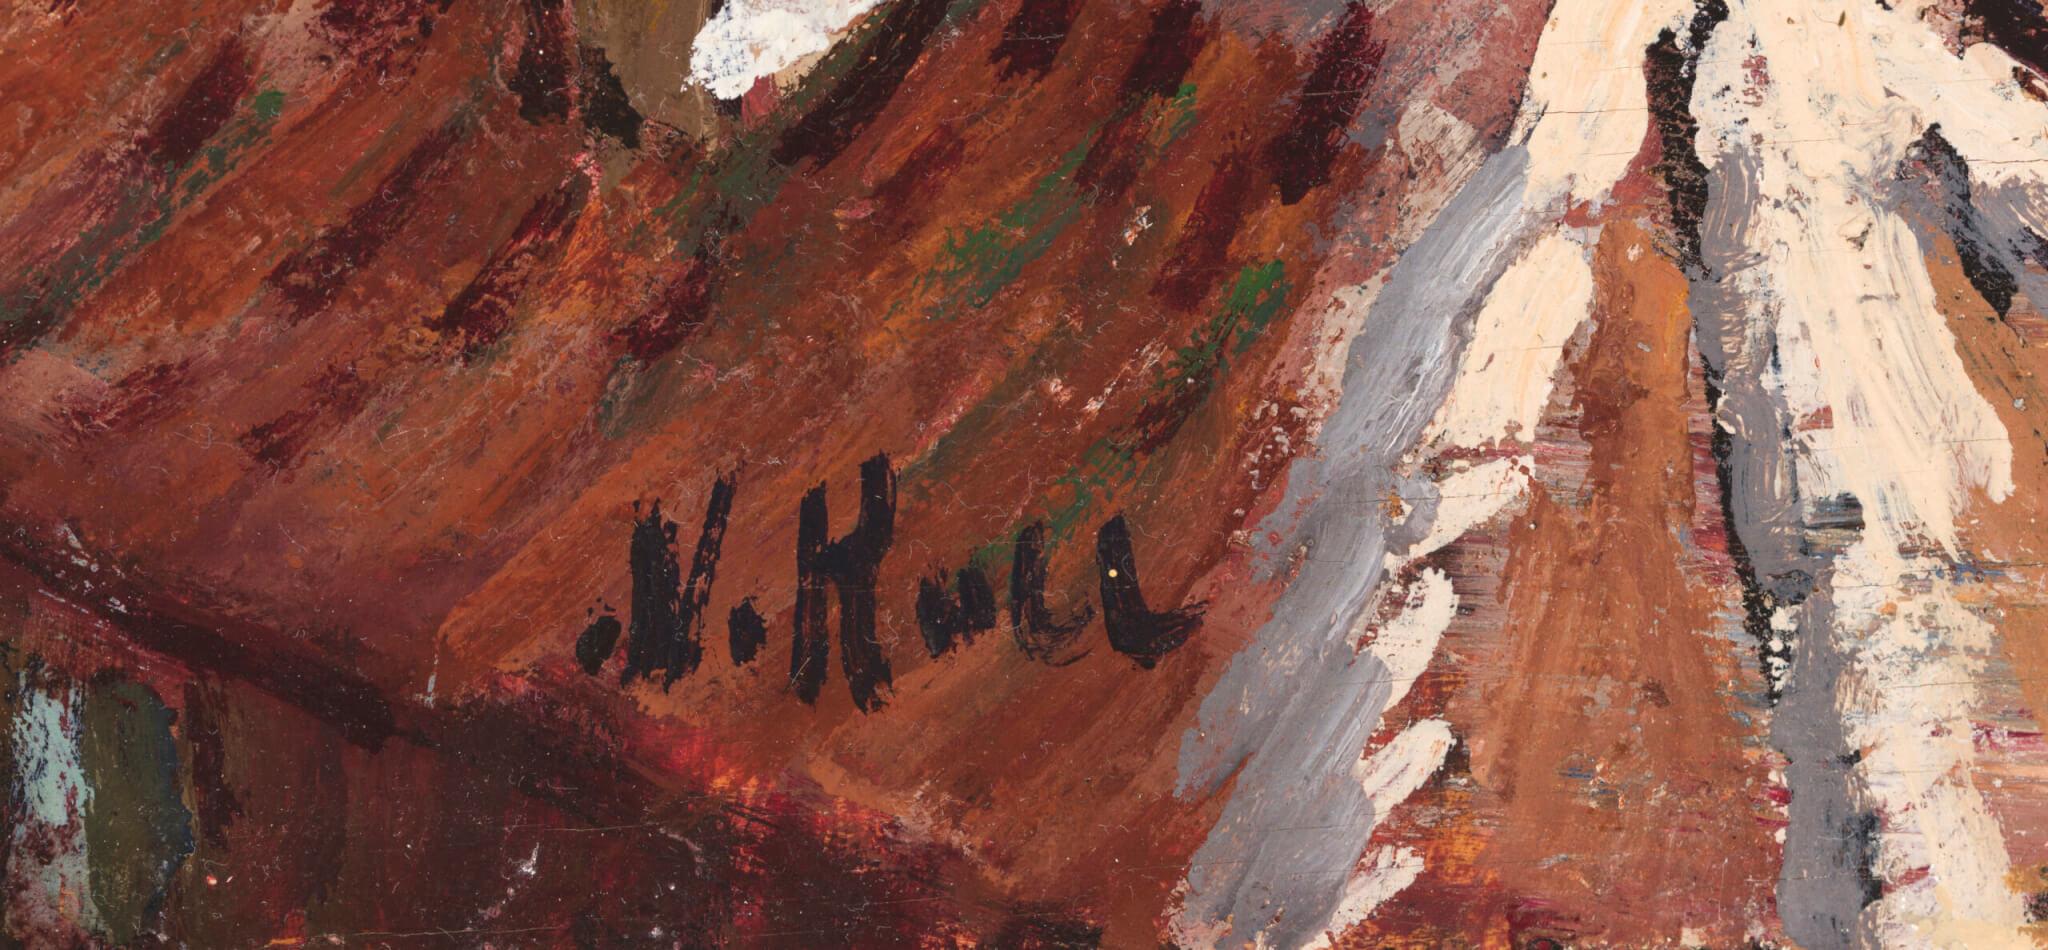 Nikolai-Kull-signatuur